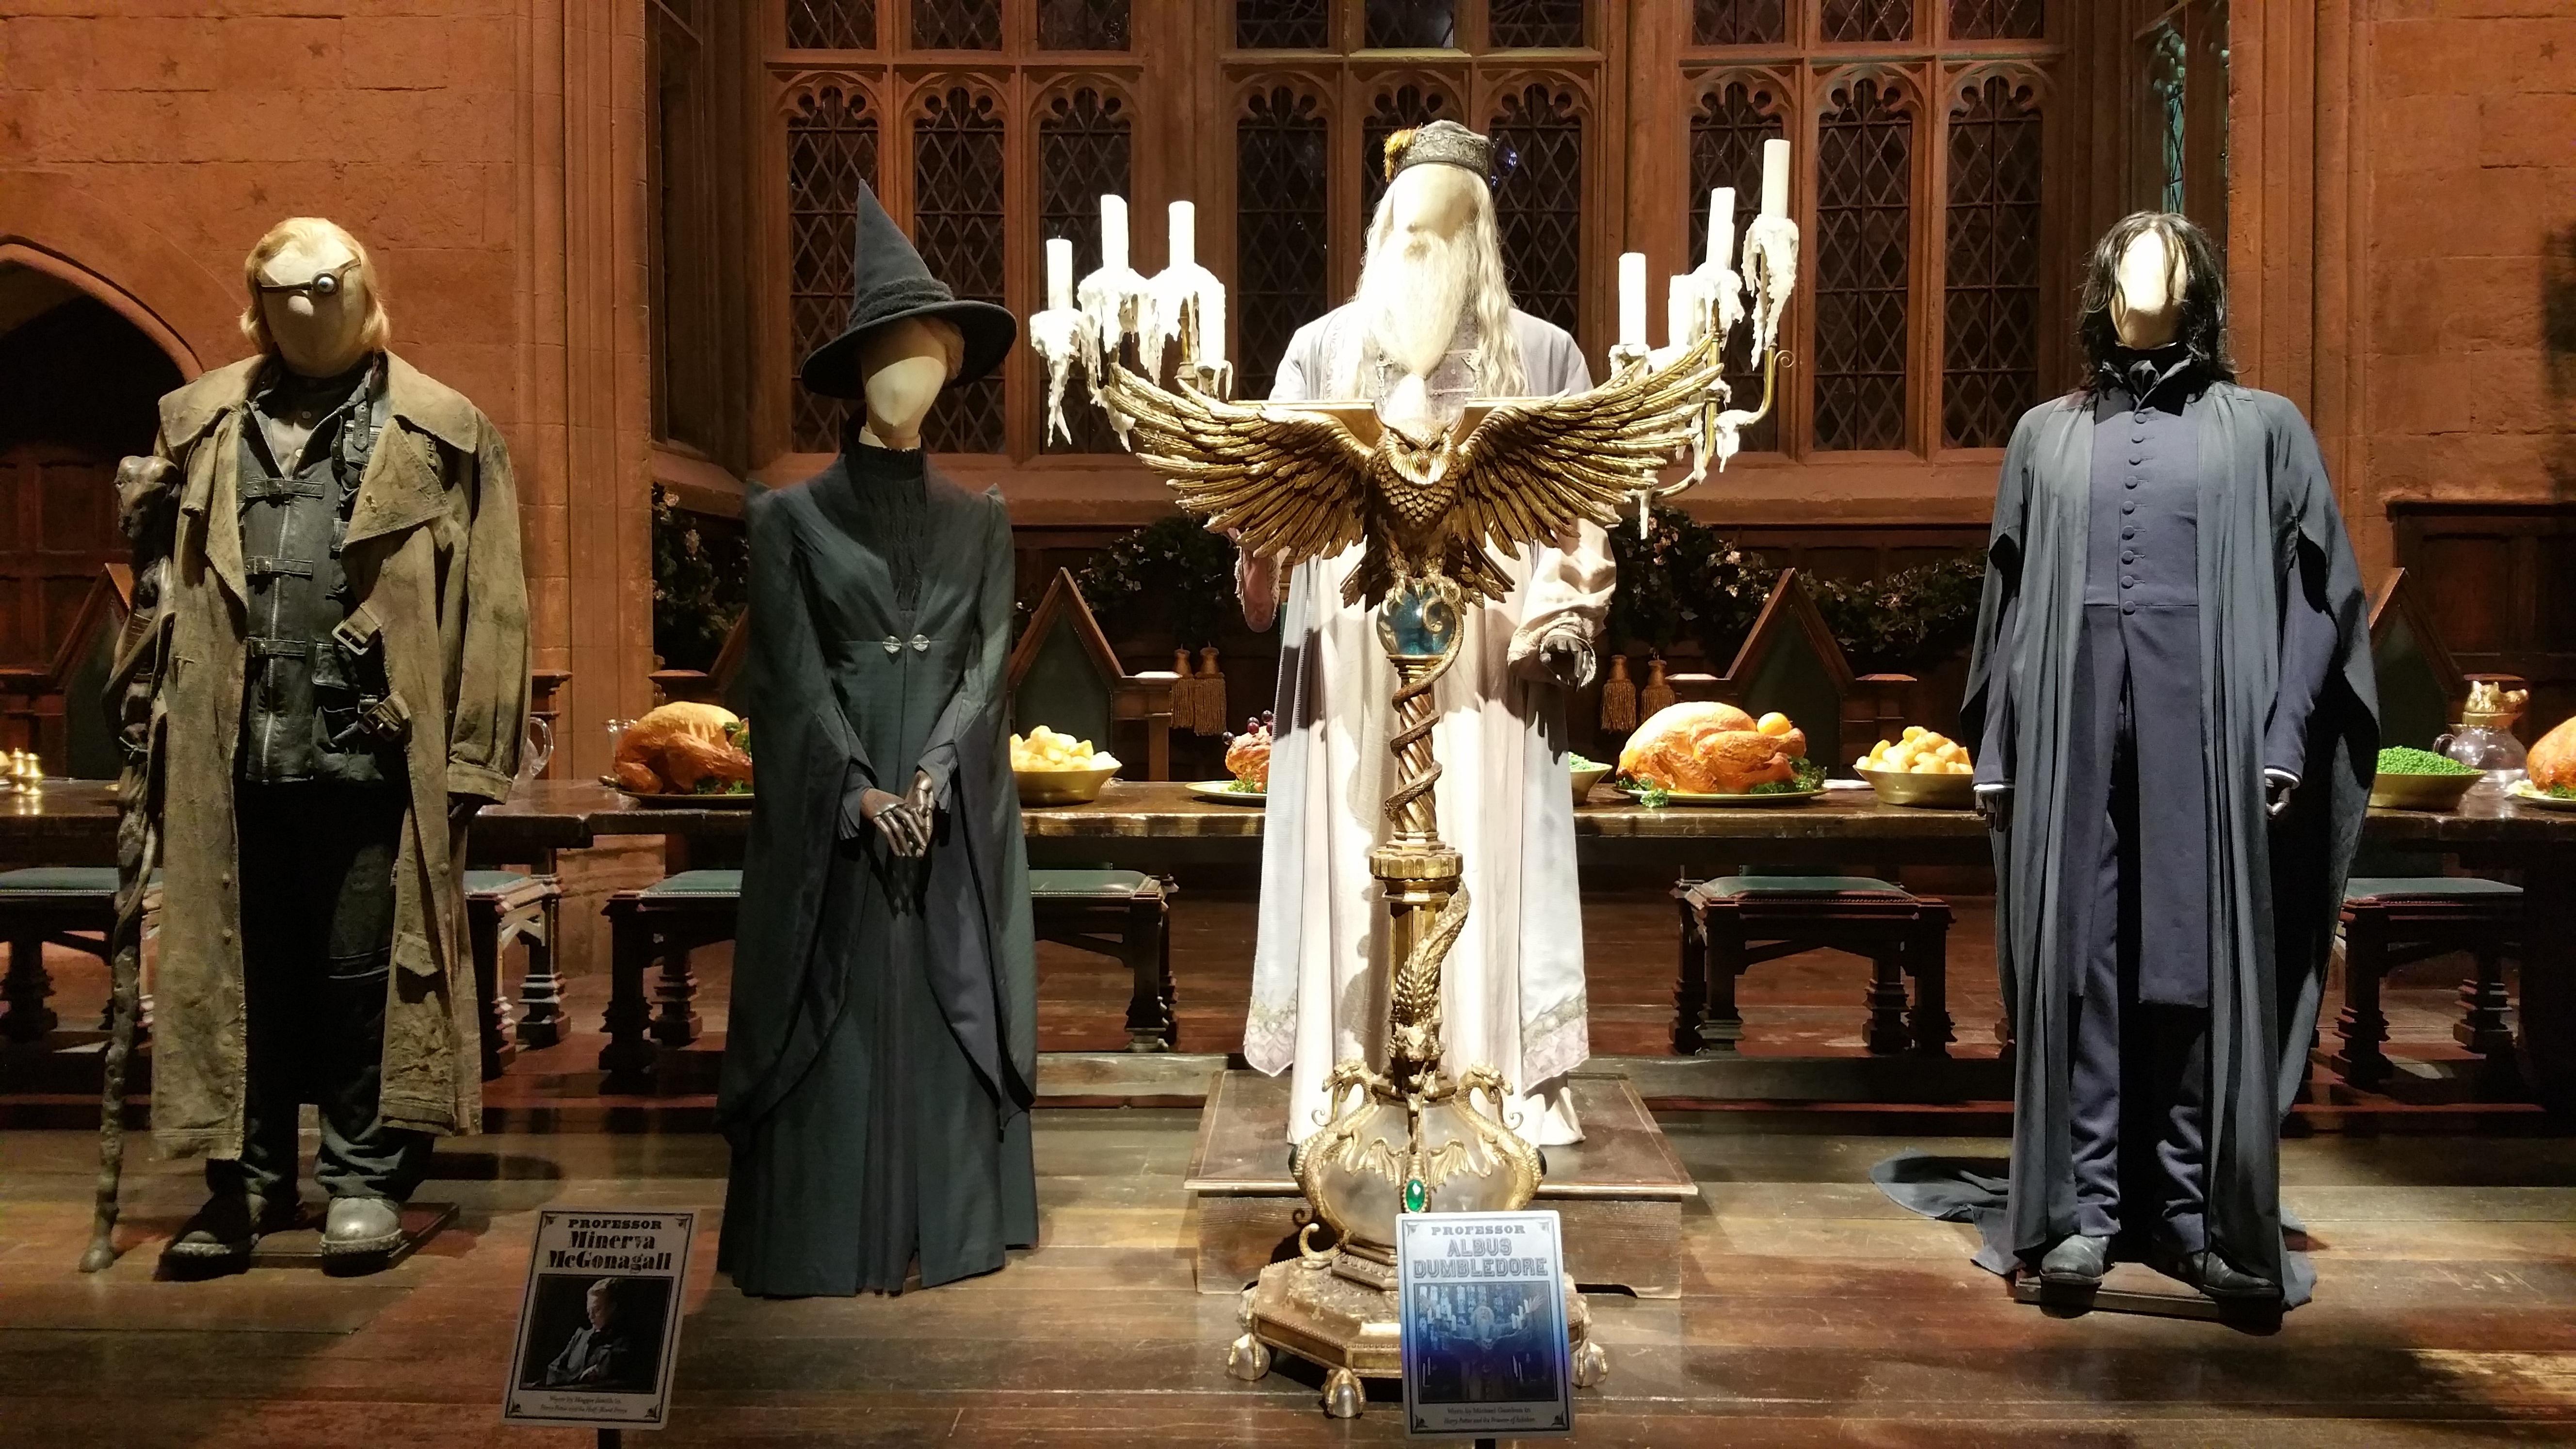 Harry Potter Religion